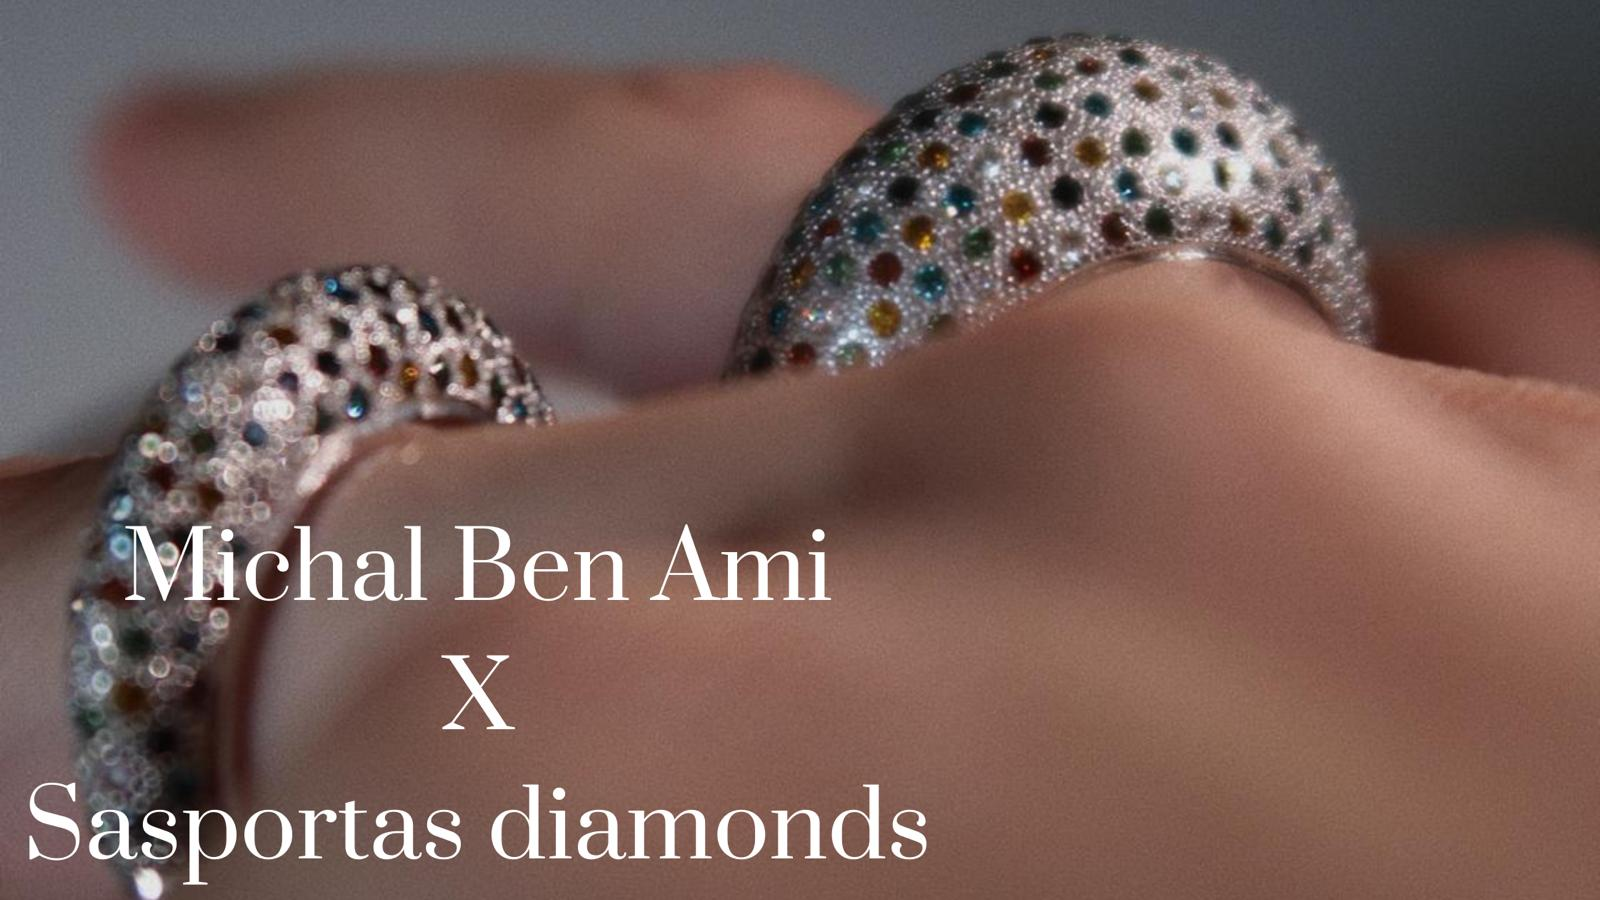 MICHAL BEN AMI X SASPORTAS DIAMONDS - מיכל בן עמי